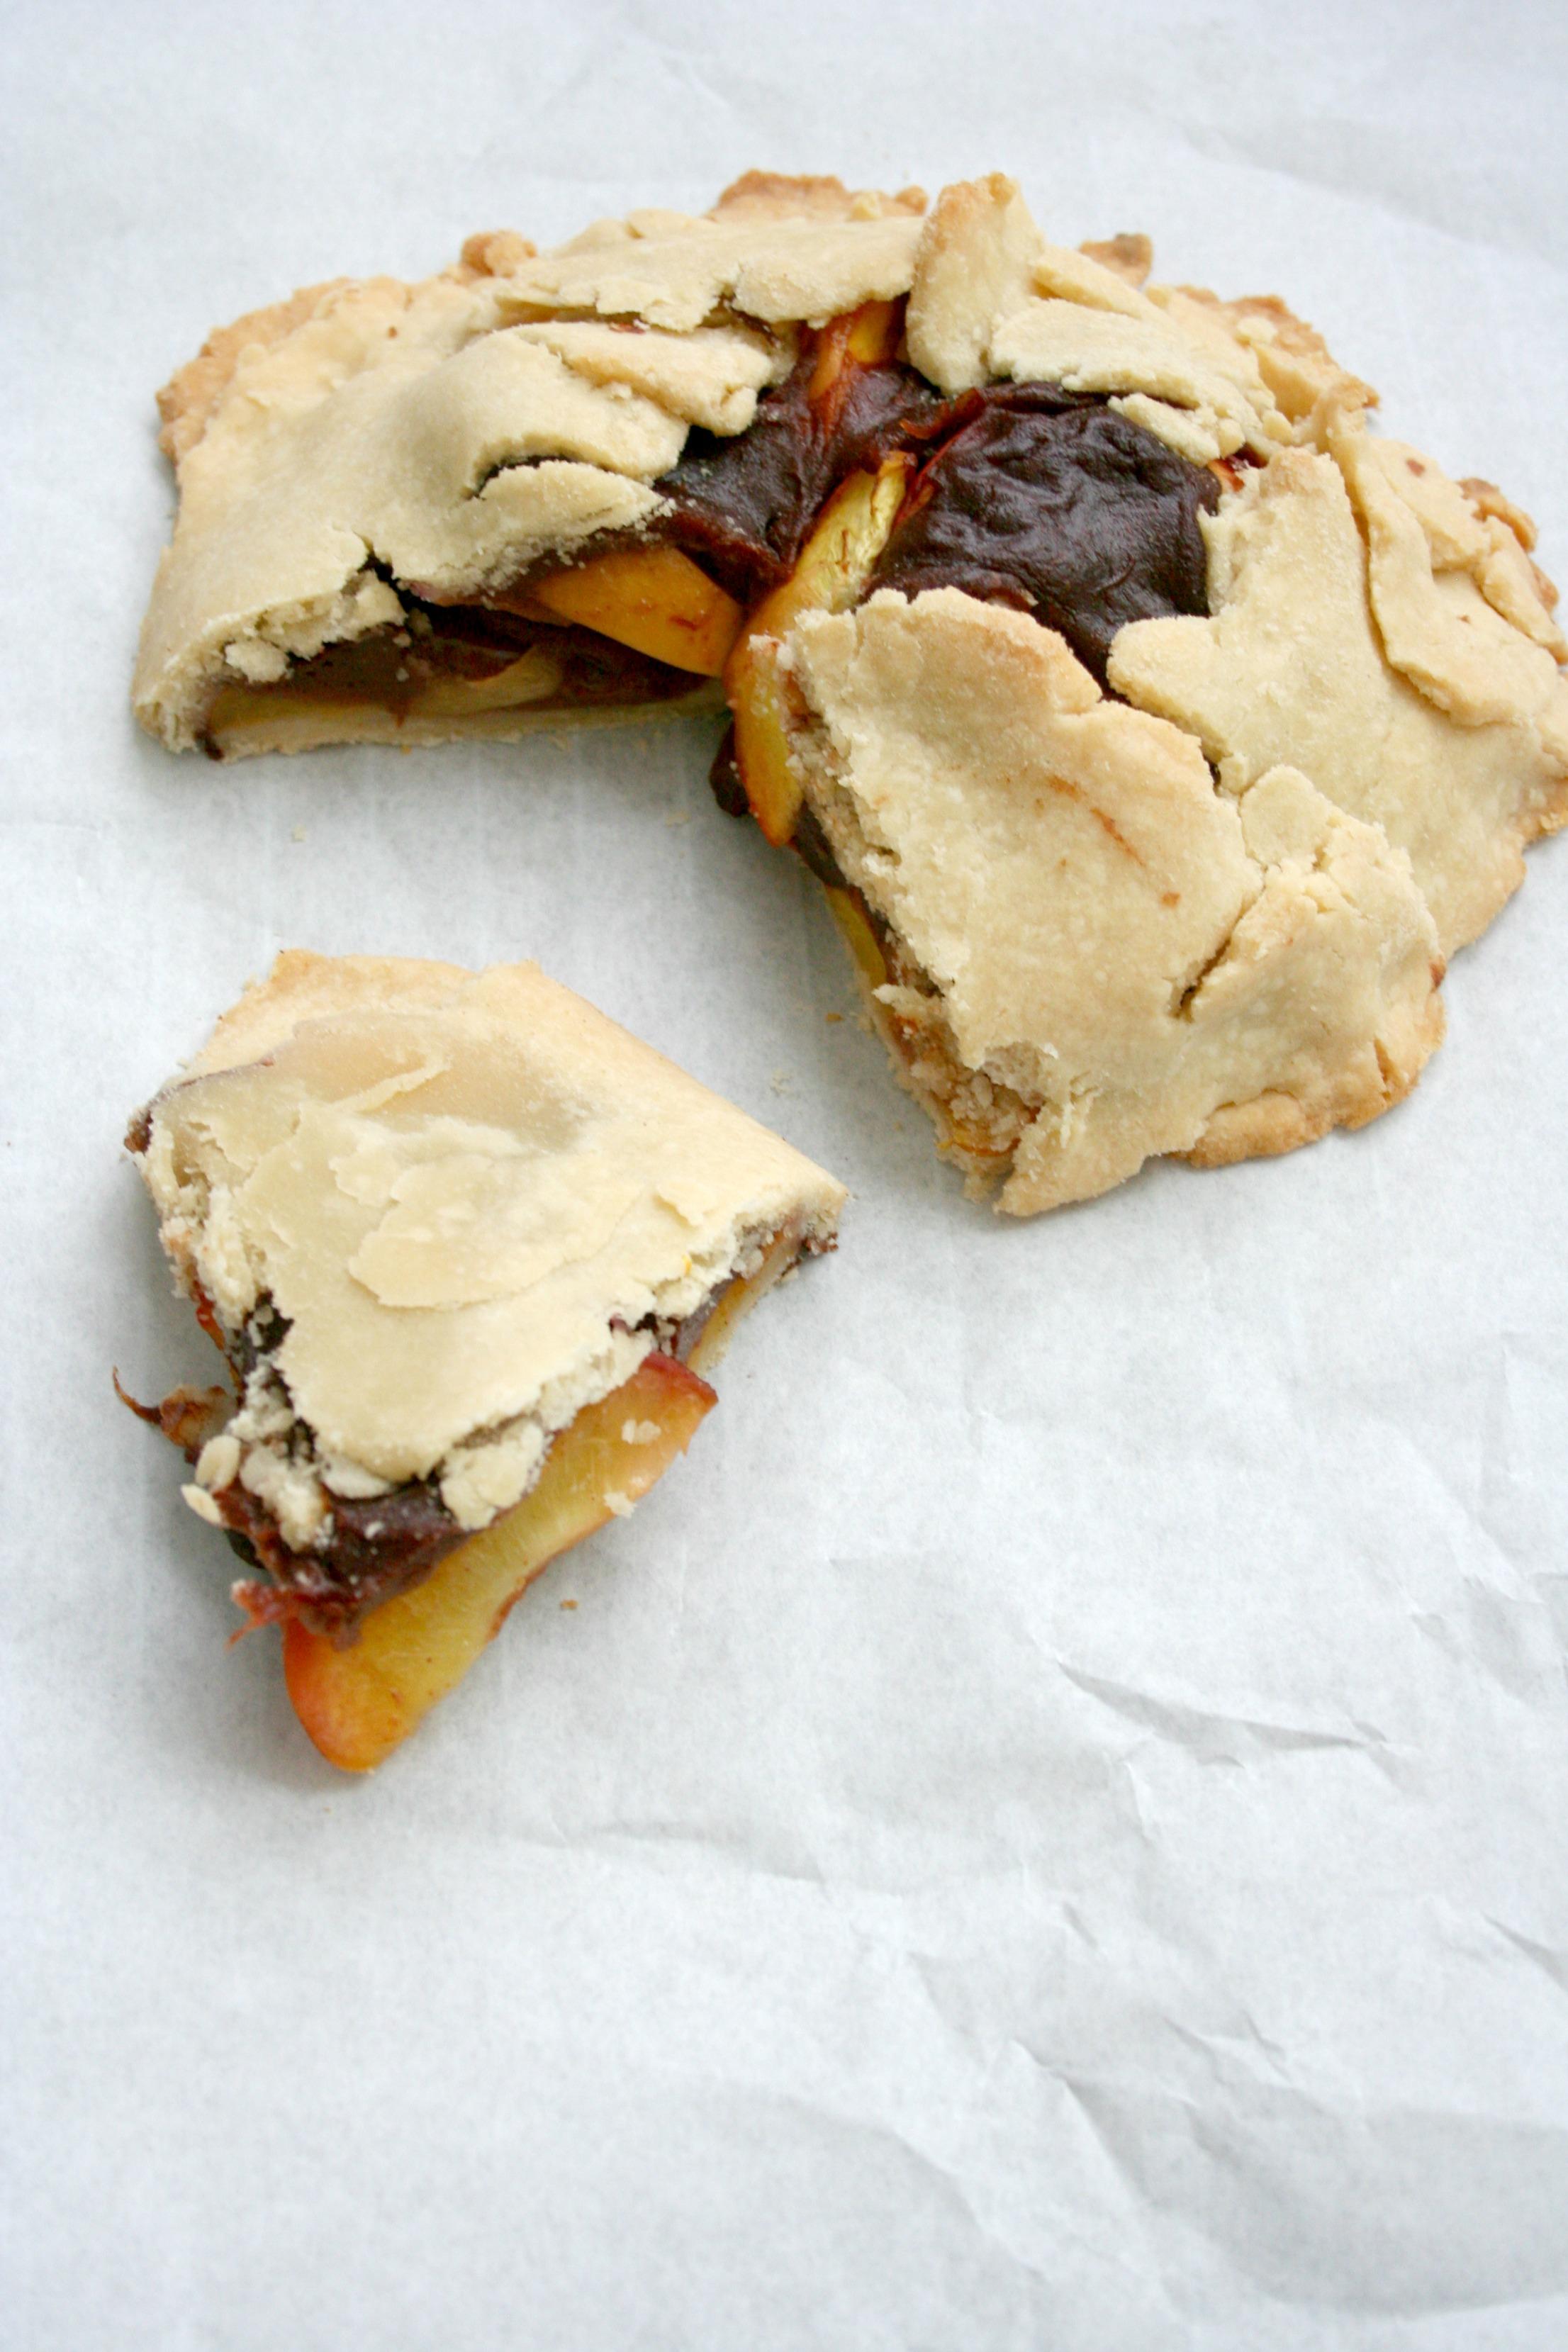 Vegan & Gluten-Free Peaches and Cream Galette | Fitting Into Vegan